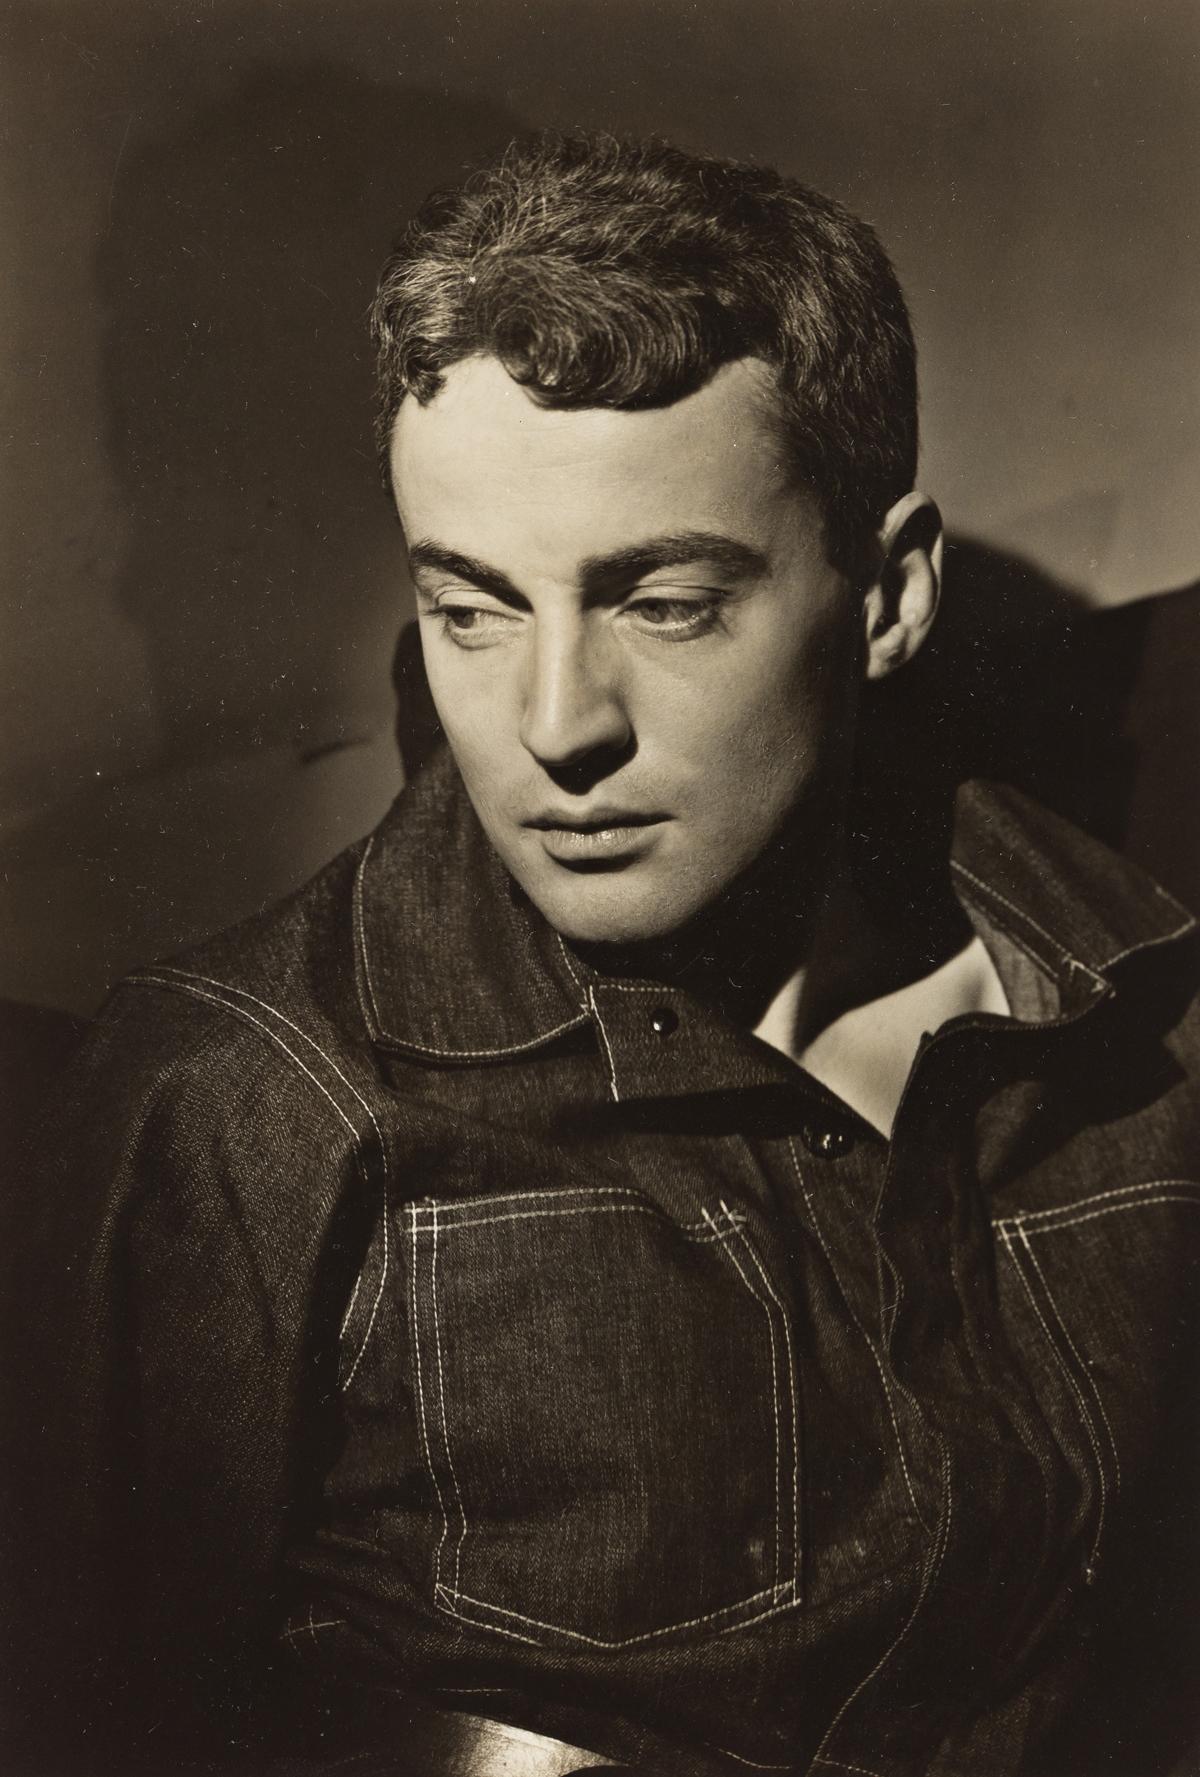 GEORGE HOYNINGEN-HUENE (1900-1968) Portrait of George Platt Lynes.